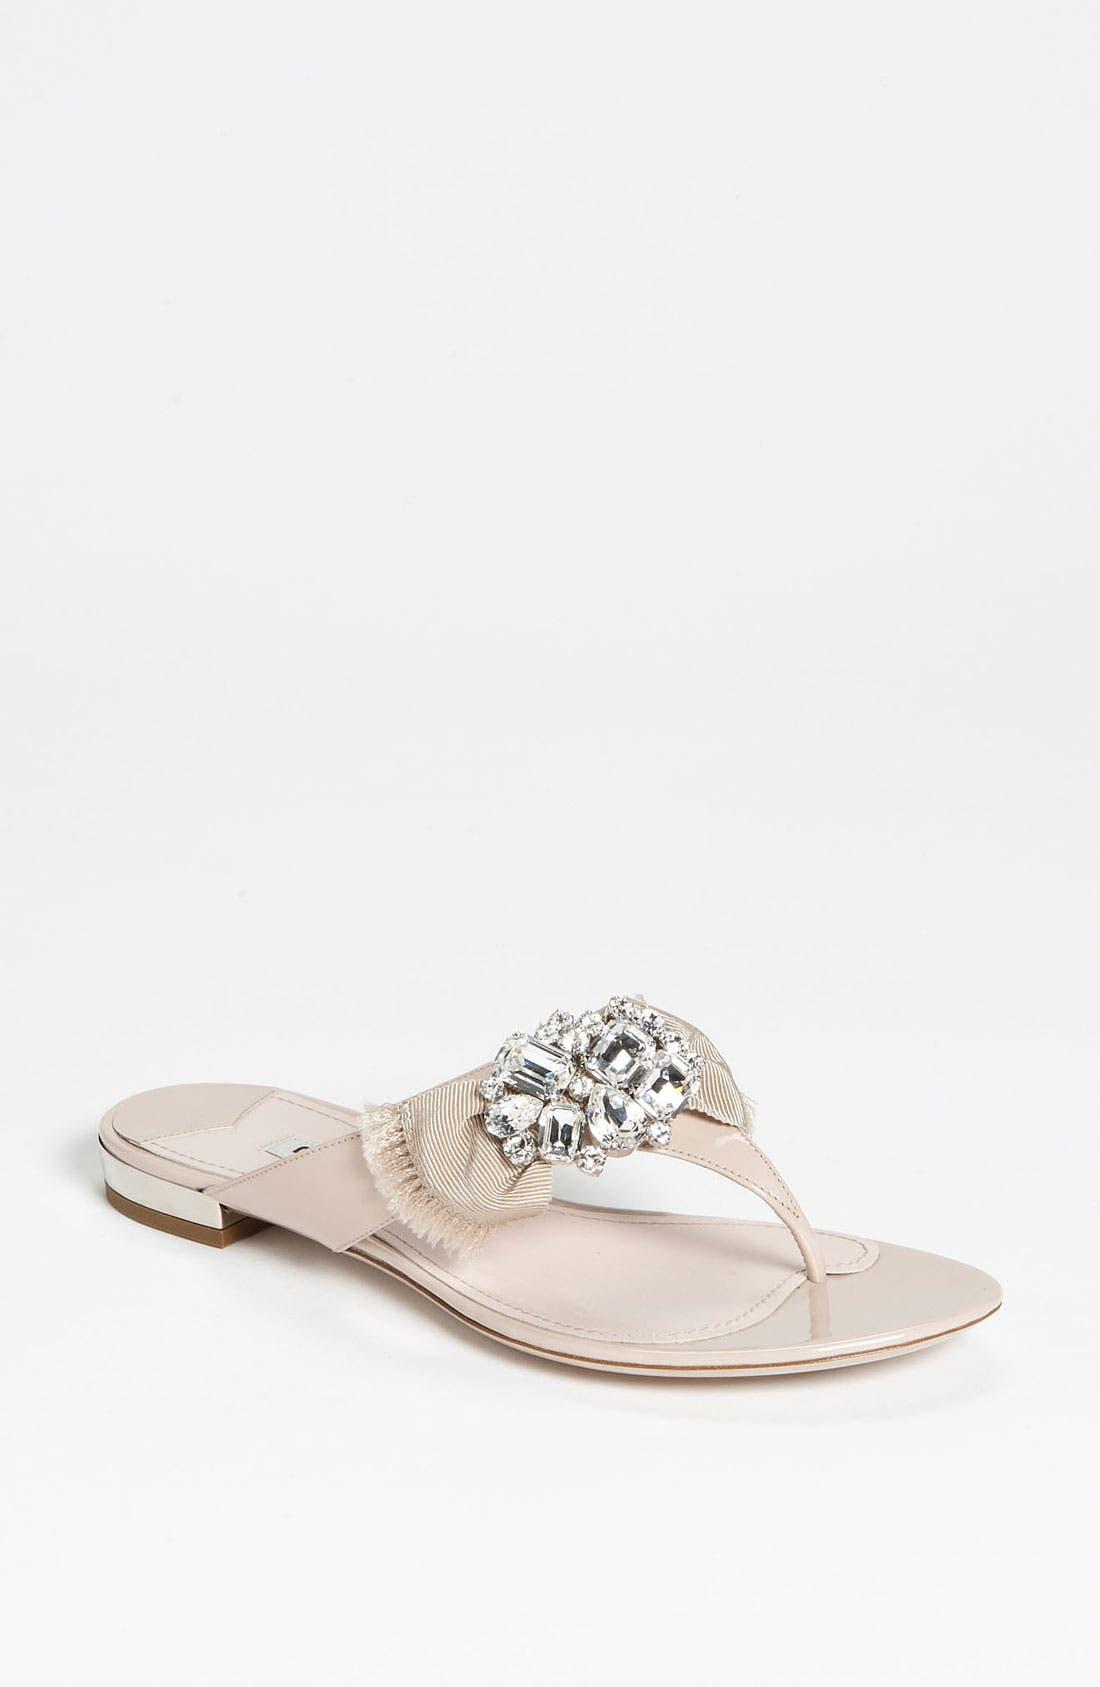 Alternate Image 1 Selected - Miu Miu Crystal Bow Thong Sandal